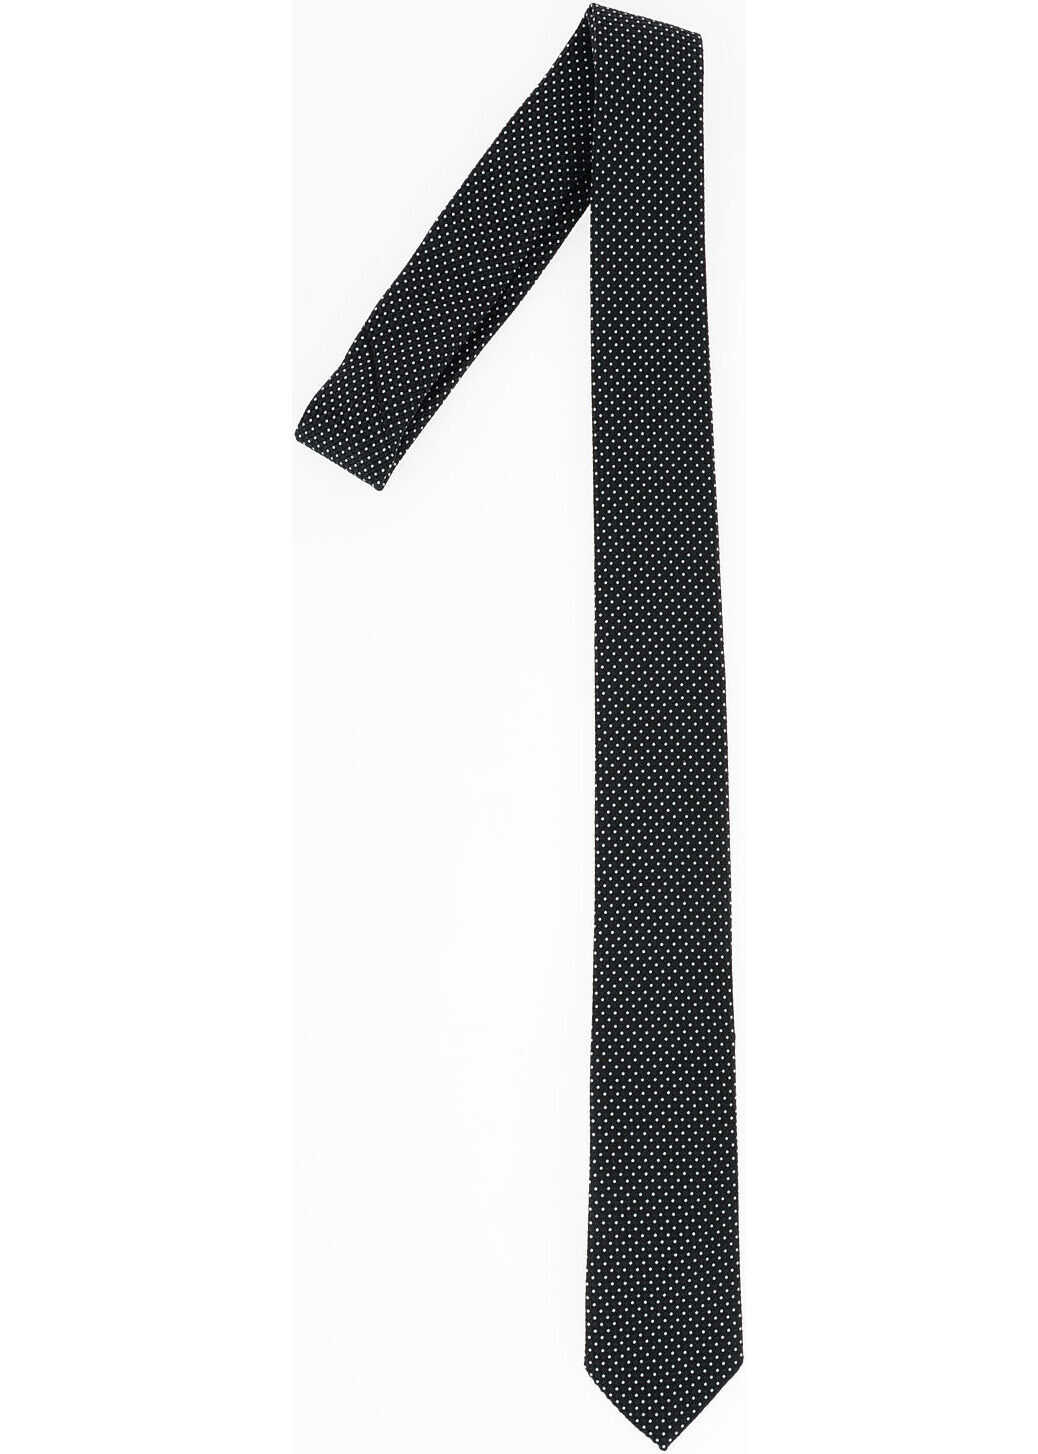 Armani EMPORIO Polka Dots Tie BLACK & WHITE